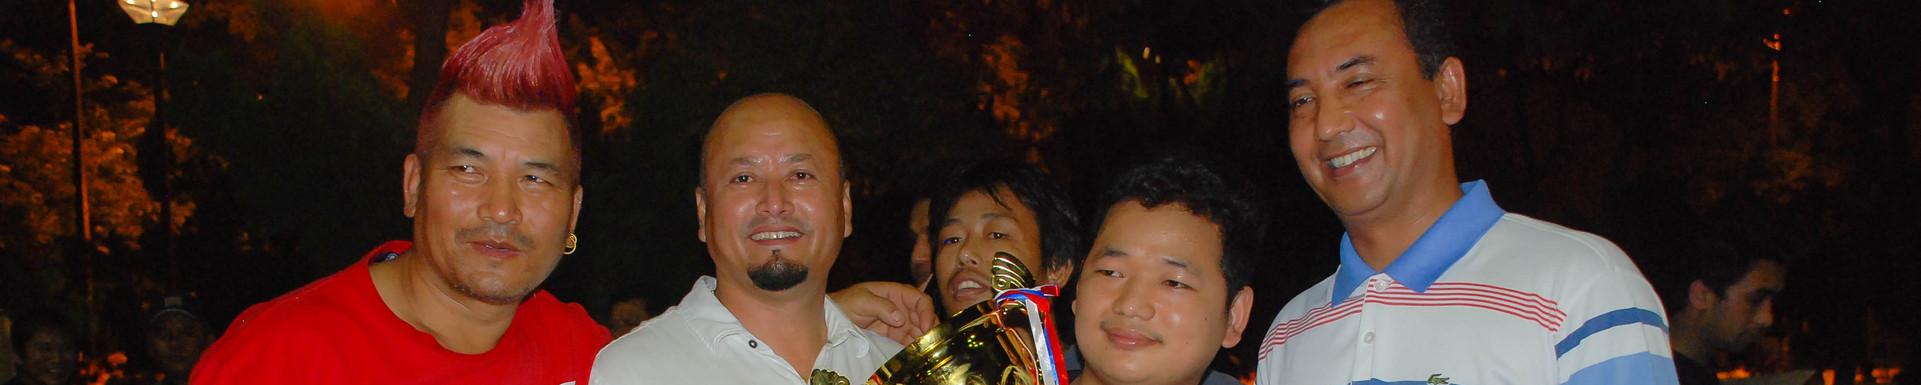 Safety award winner